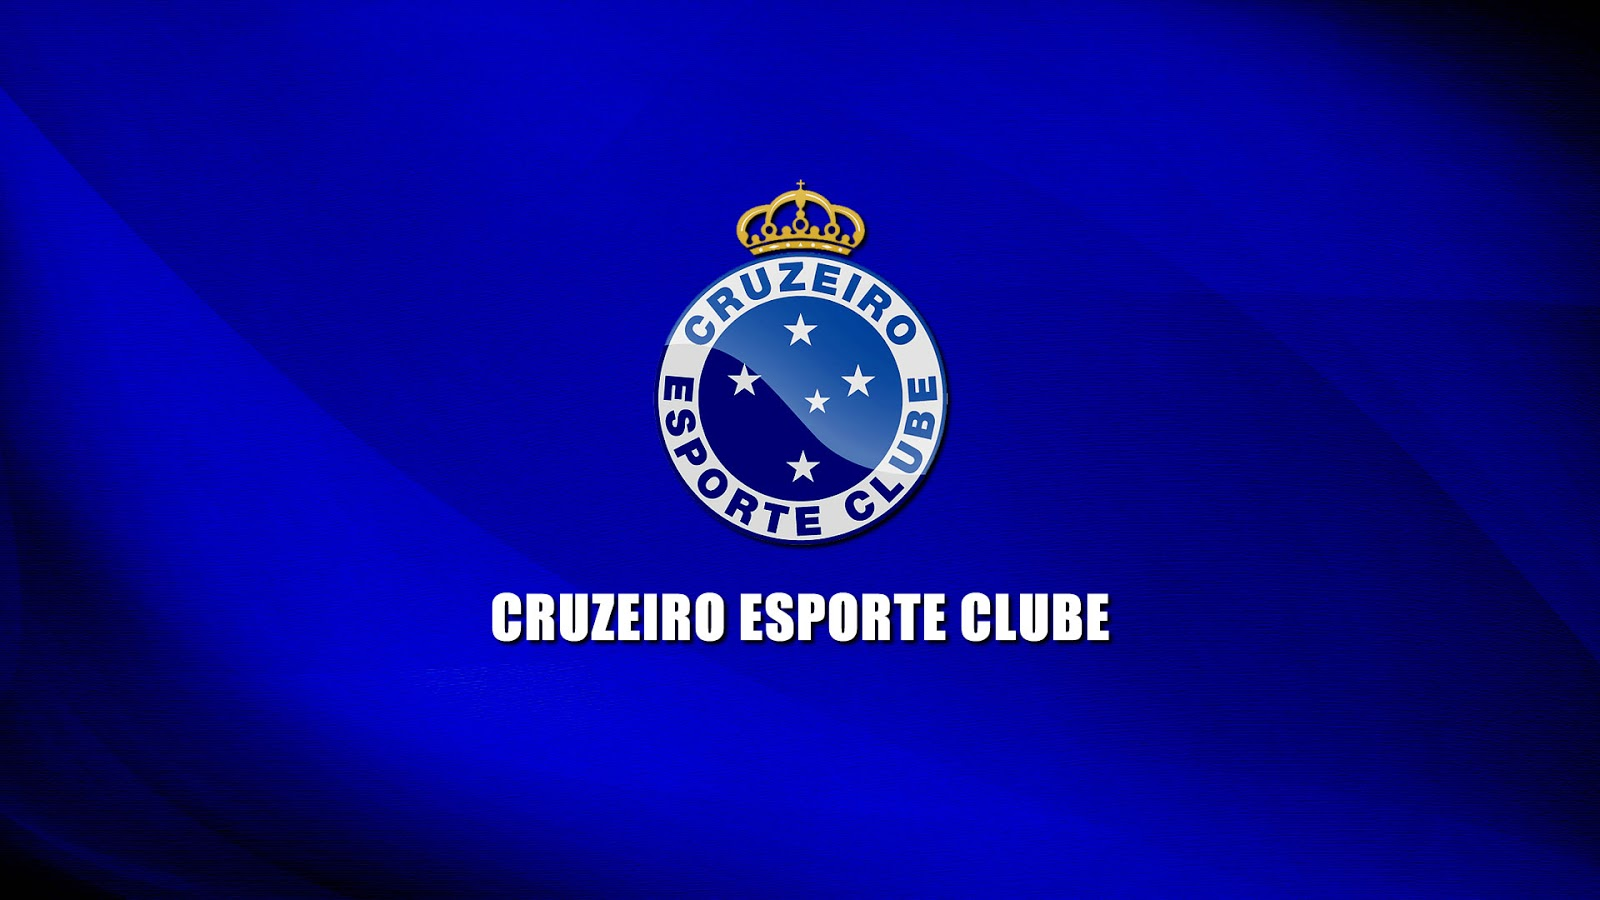 Cruzeiro Esporte Clube 07e127c503c12